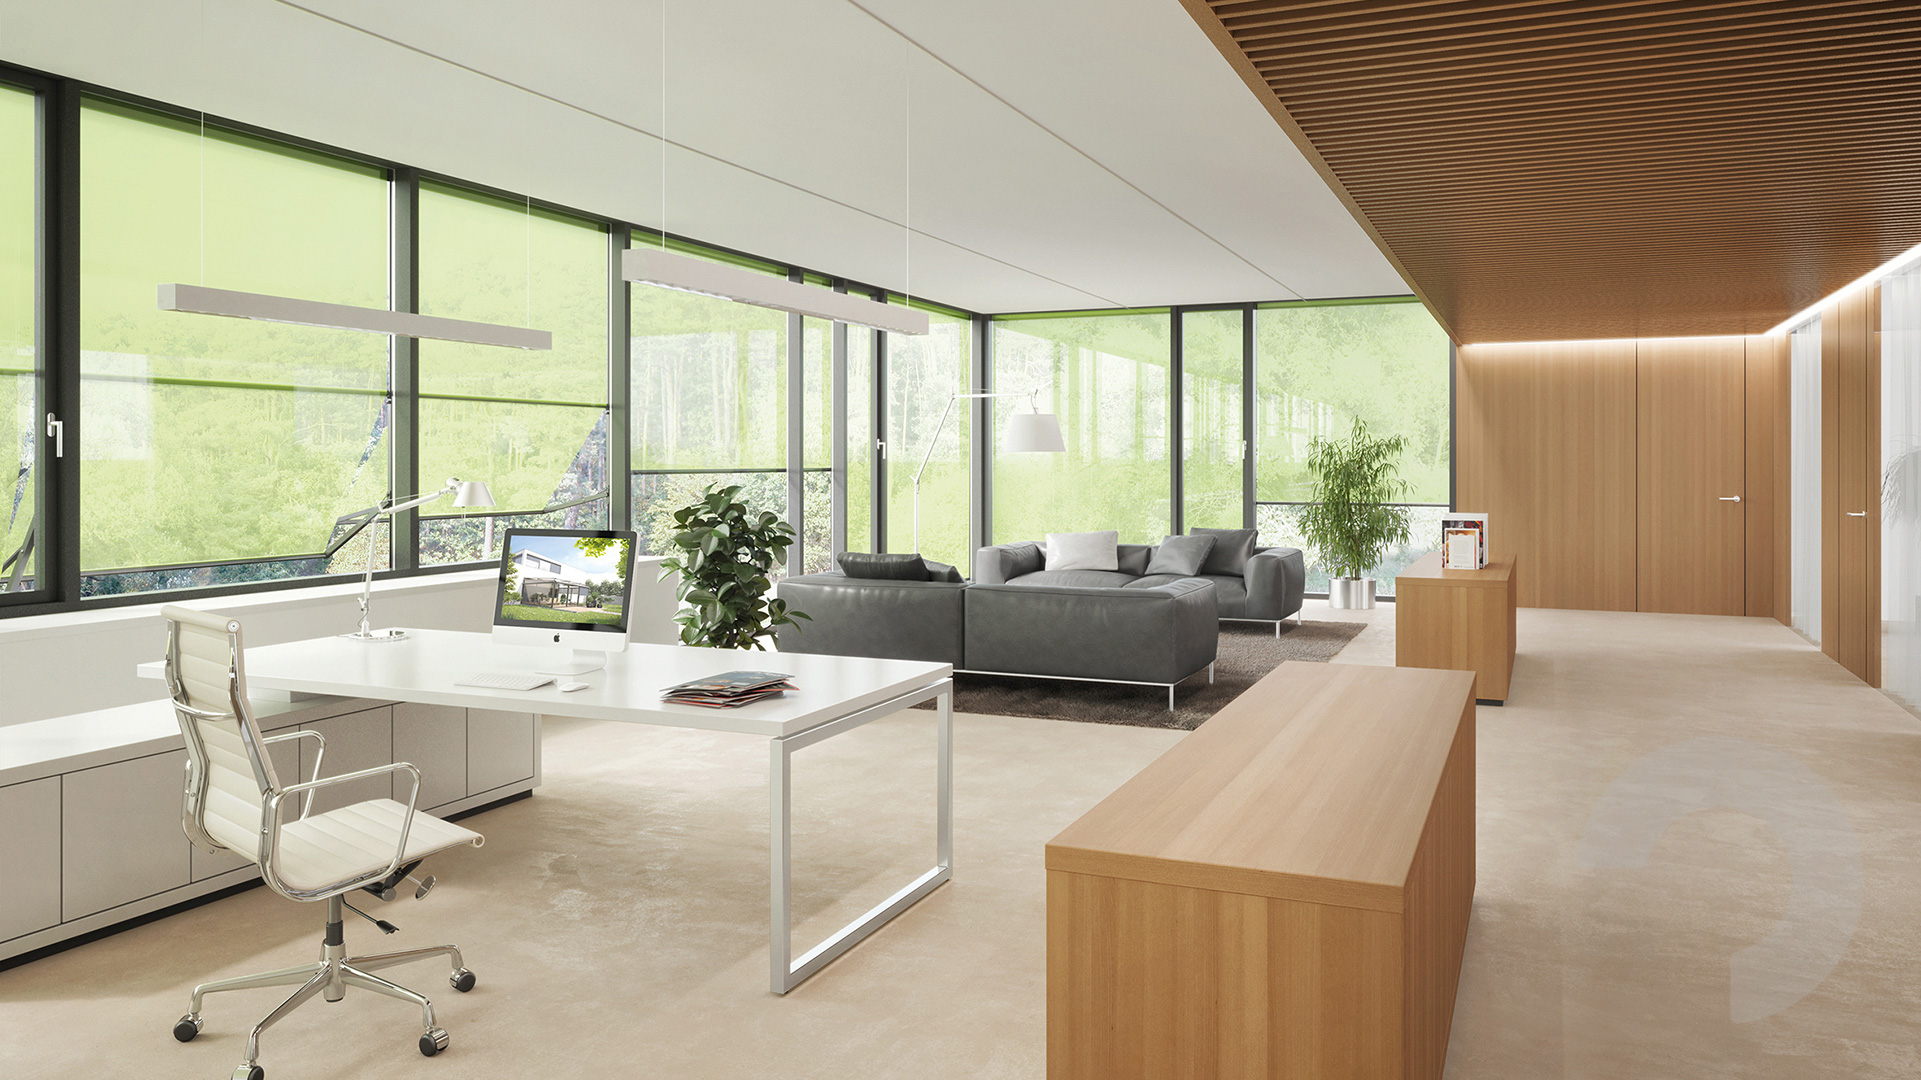 fm_interior_office_hd_16_9